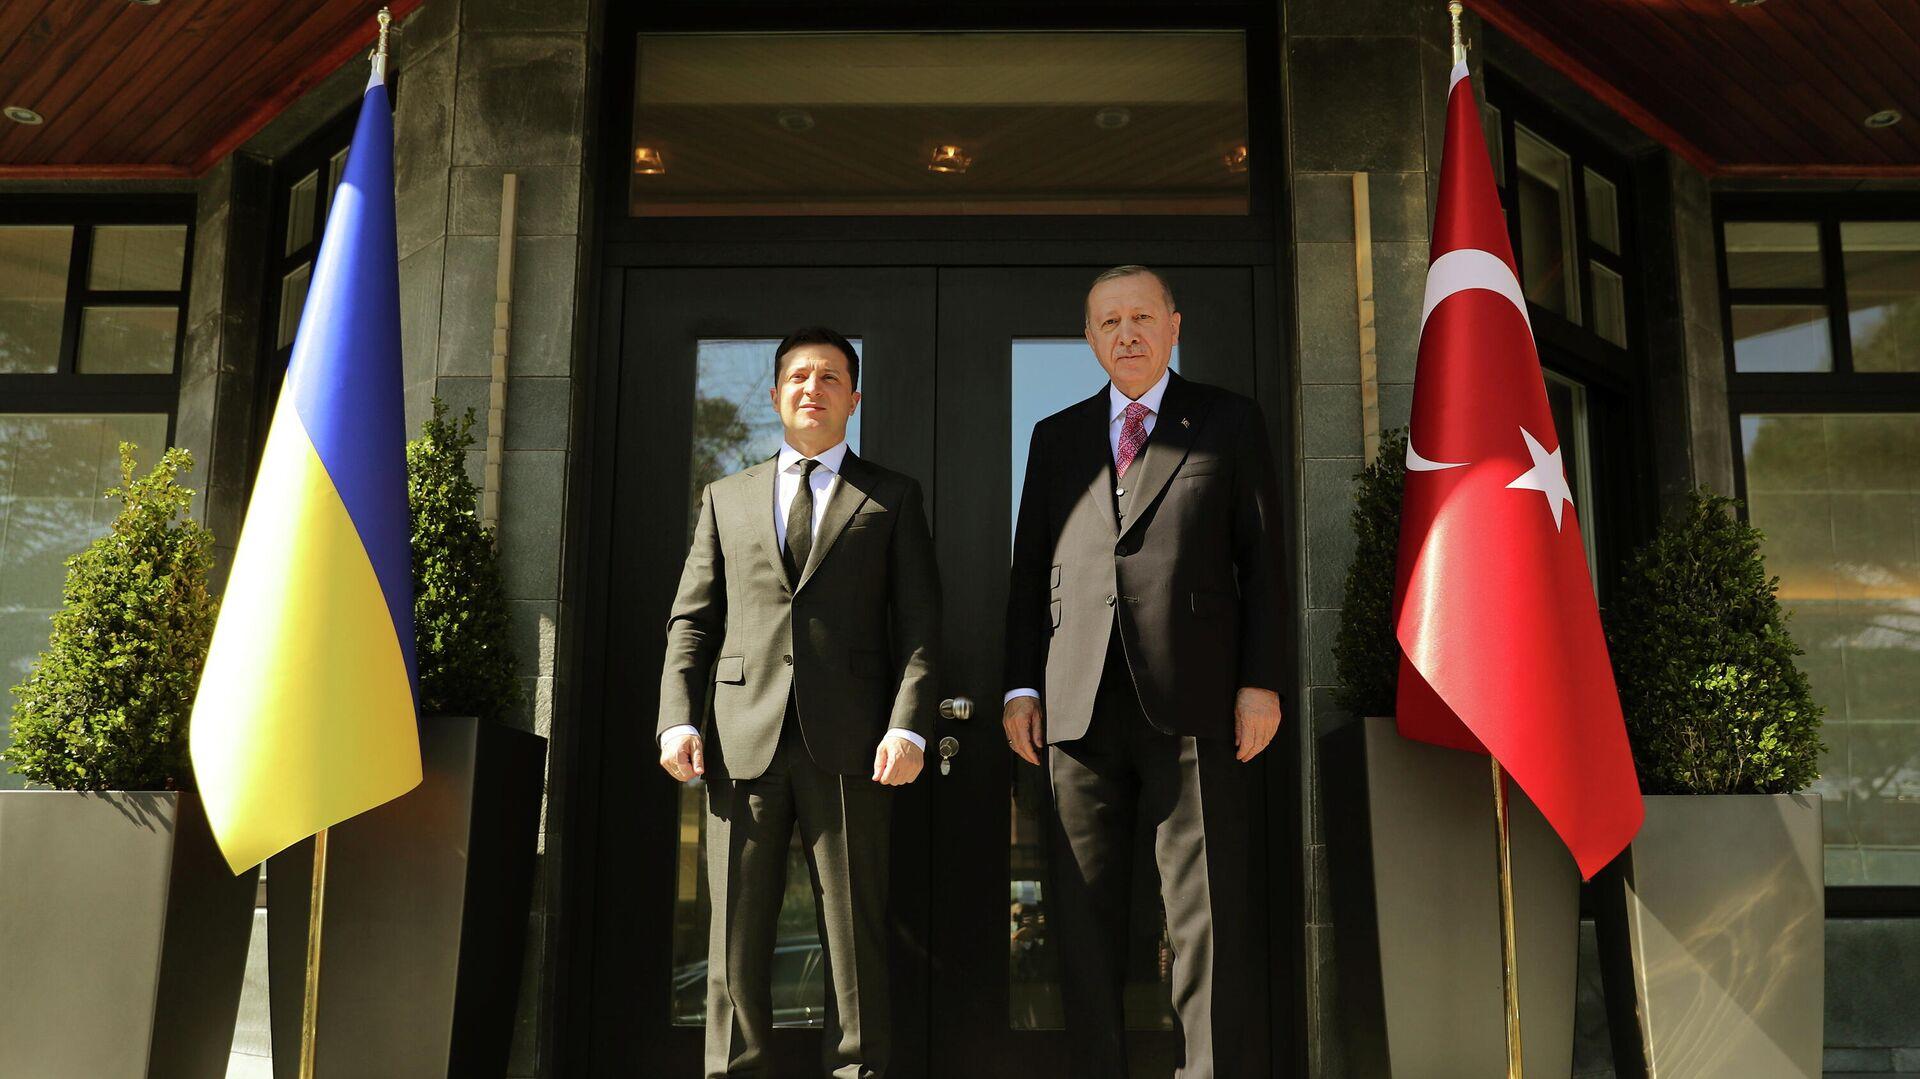 Volodímir Zelenski, presidente ucraniano y Recep Tayyip Erdogan, presidente de Turquía - Sputnik Mundo, 1920, 10.04.2021